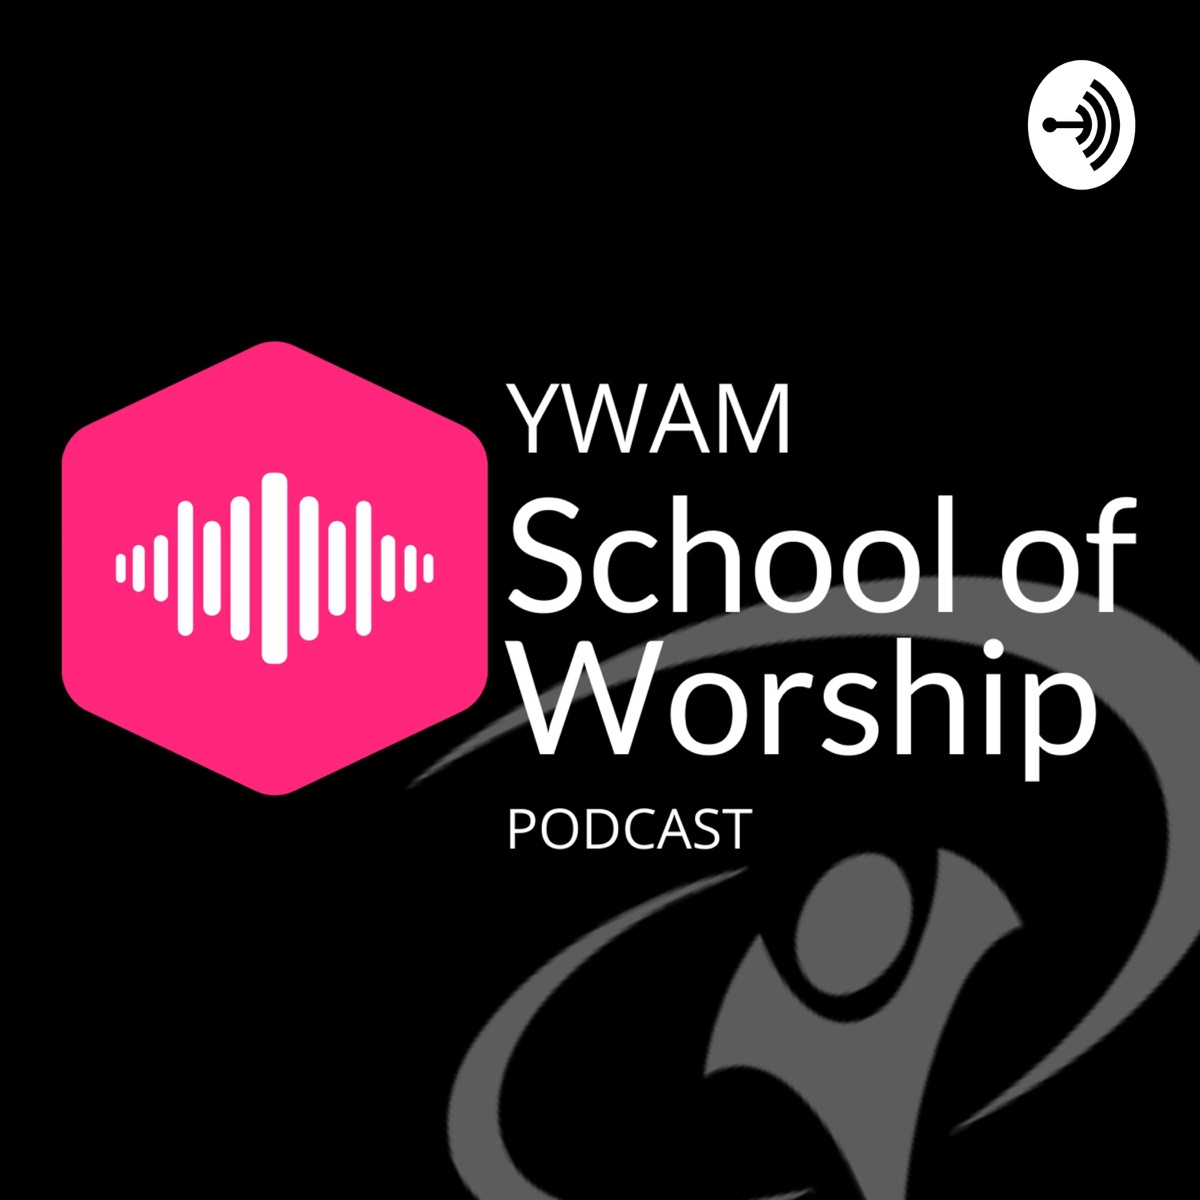 YWAM School of Worship PODCAST